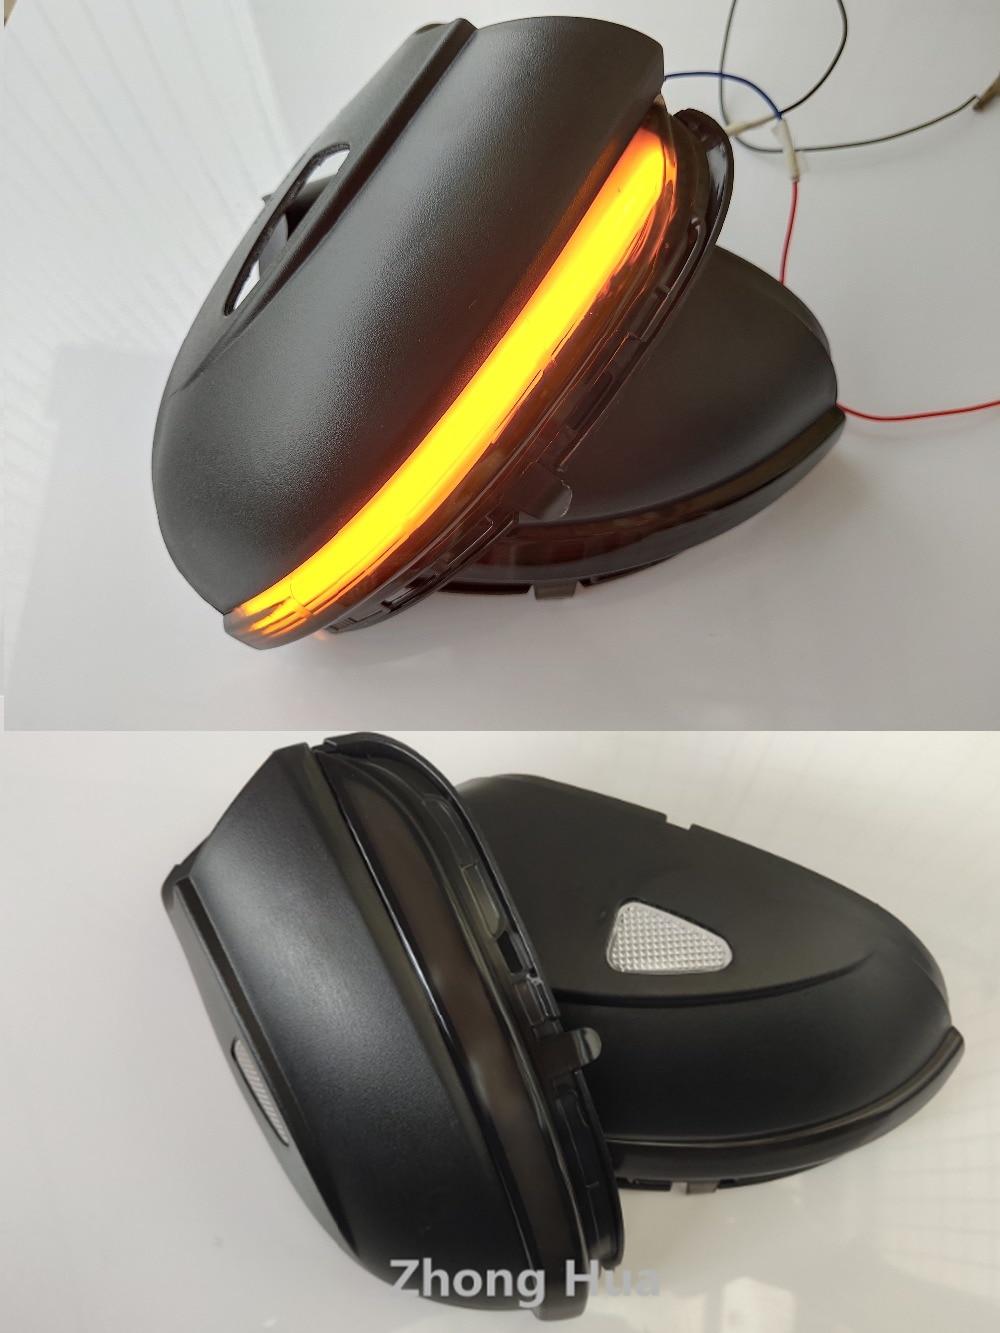 Dynamic Mirror Indicator Blinker for Golf MK6 G TI 6 R line Side LED Turn Signal